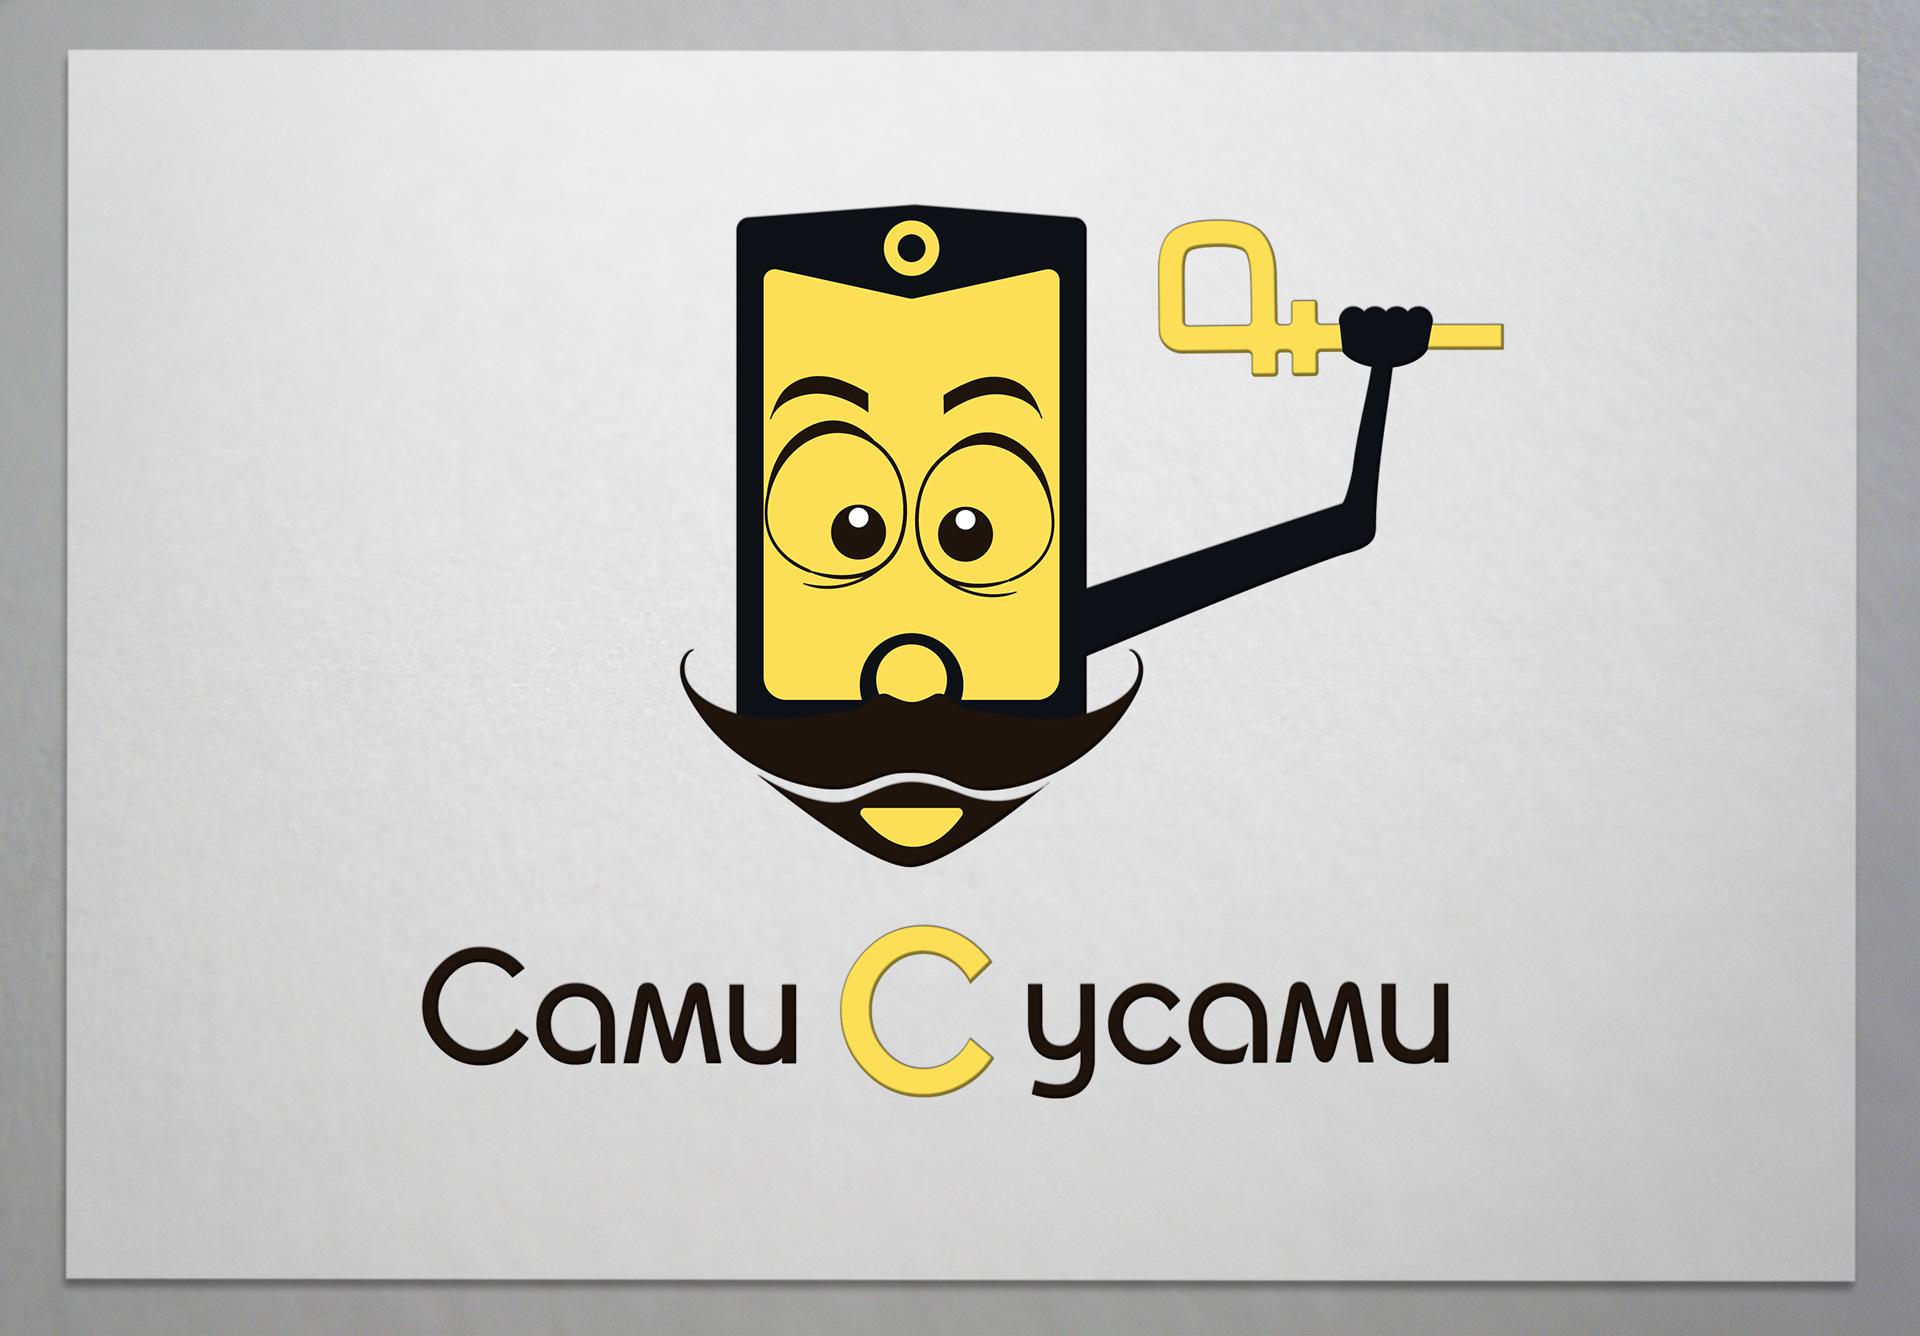 Разработка Логотипа 6 000 руб. фото f_29858f7b93e1bd77.jpg